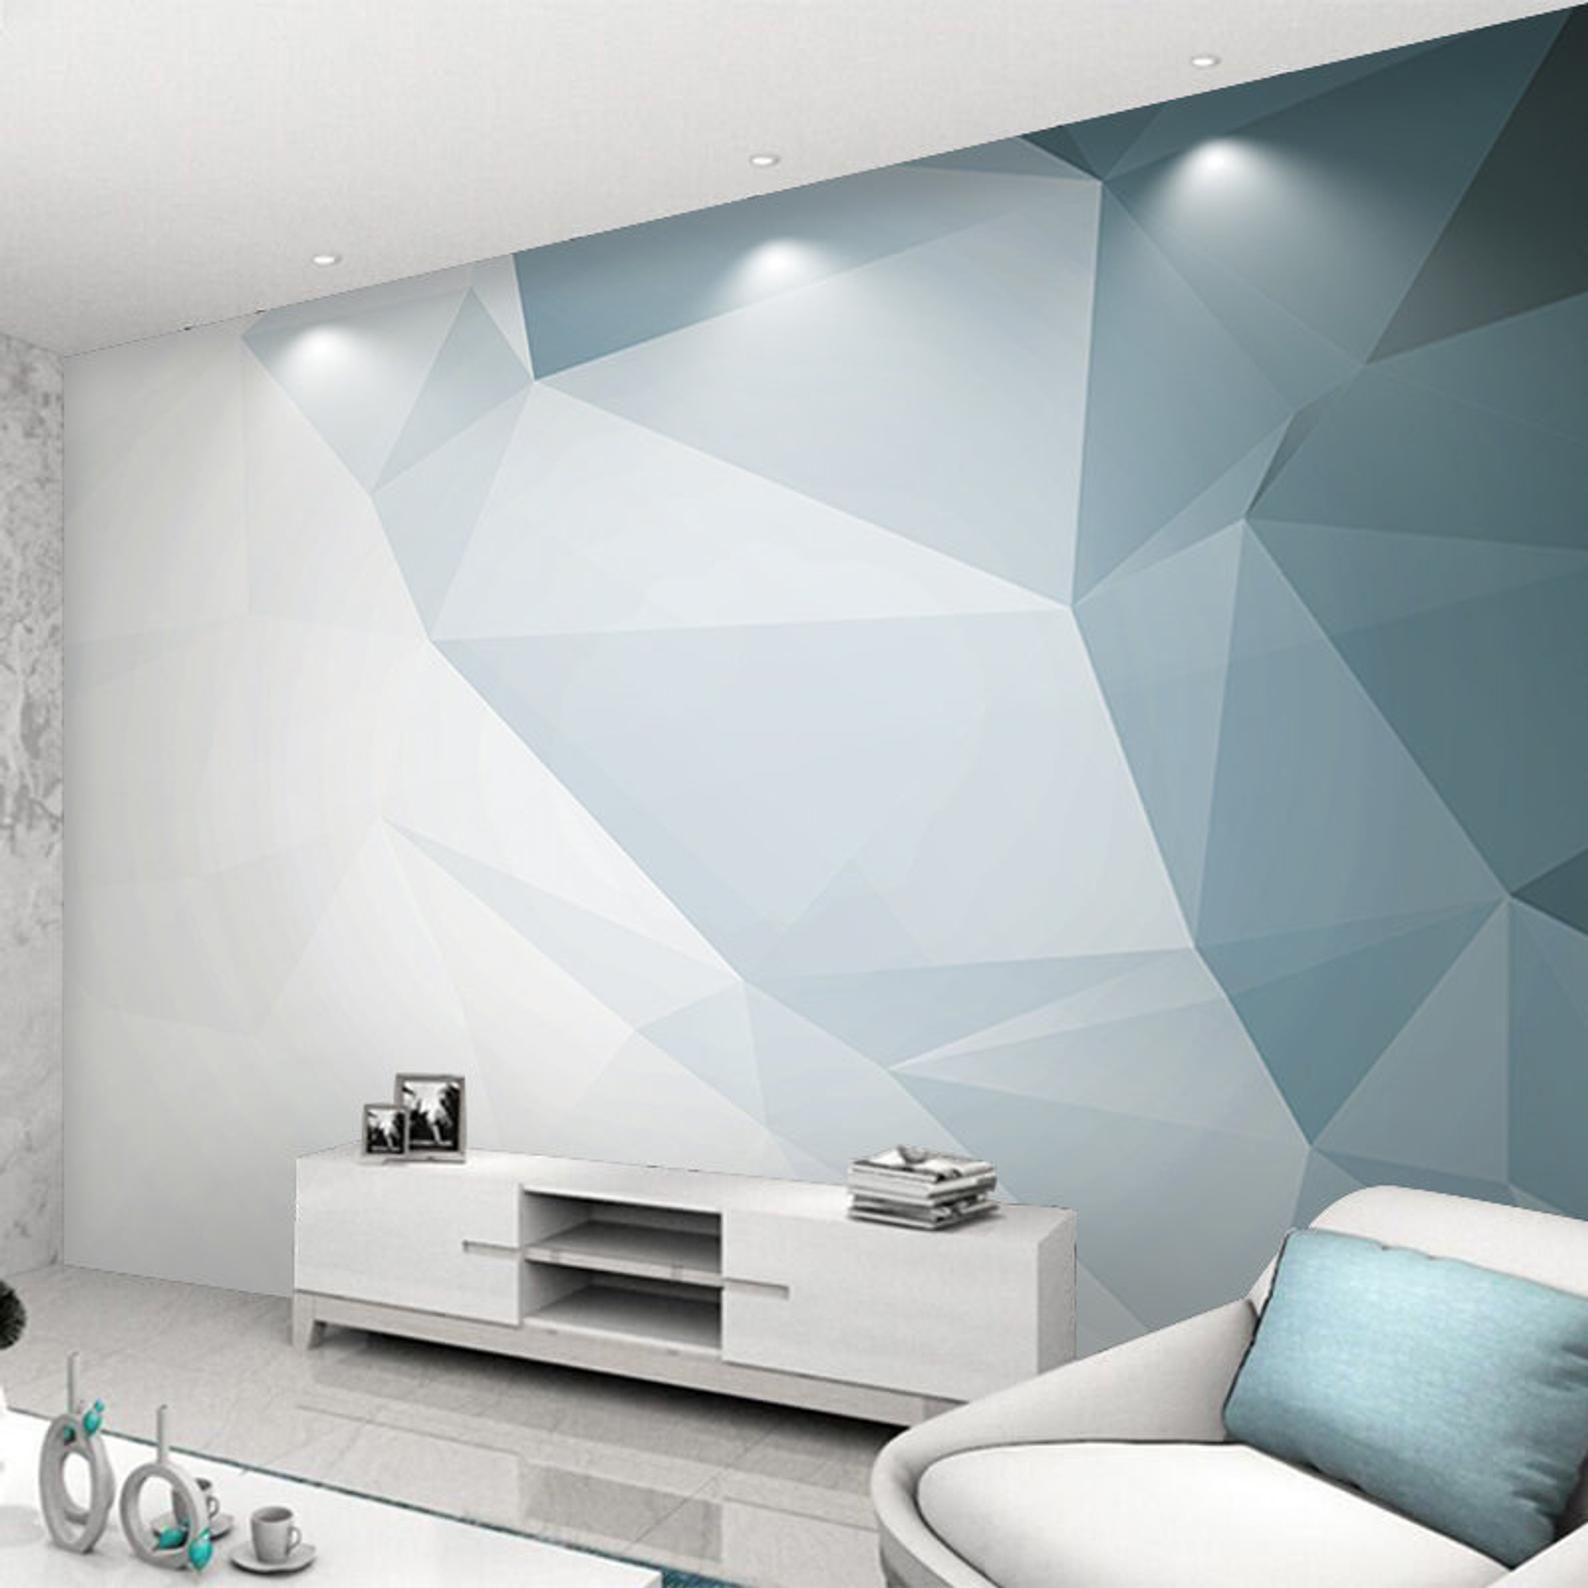 Modern Geometric Stereoscopic Wallpaper Wall Mural Imaginary